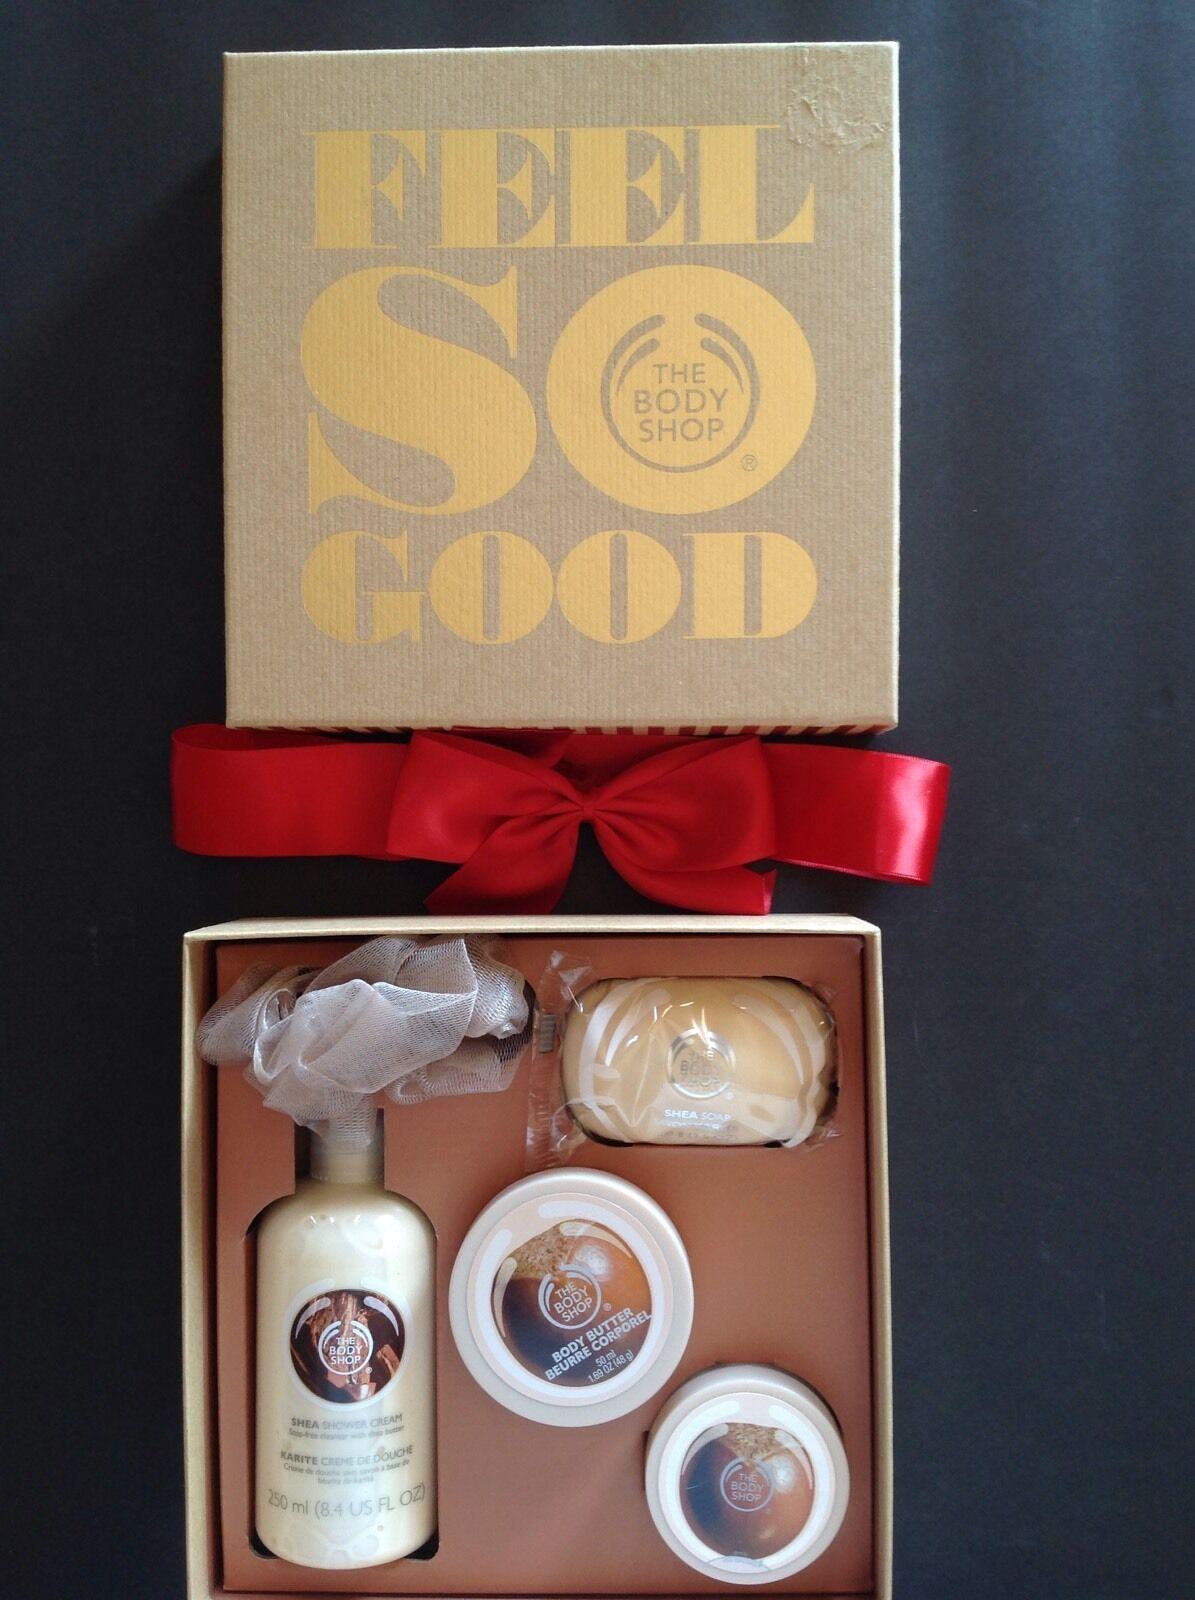 The Body Shop Shea Festive Picks Soap Shower Cream Body Butt